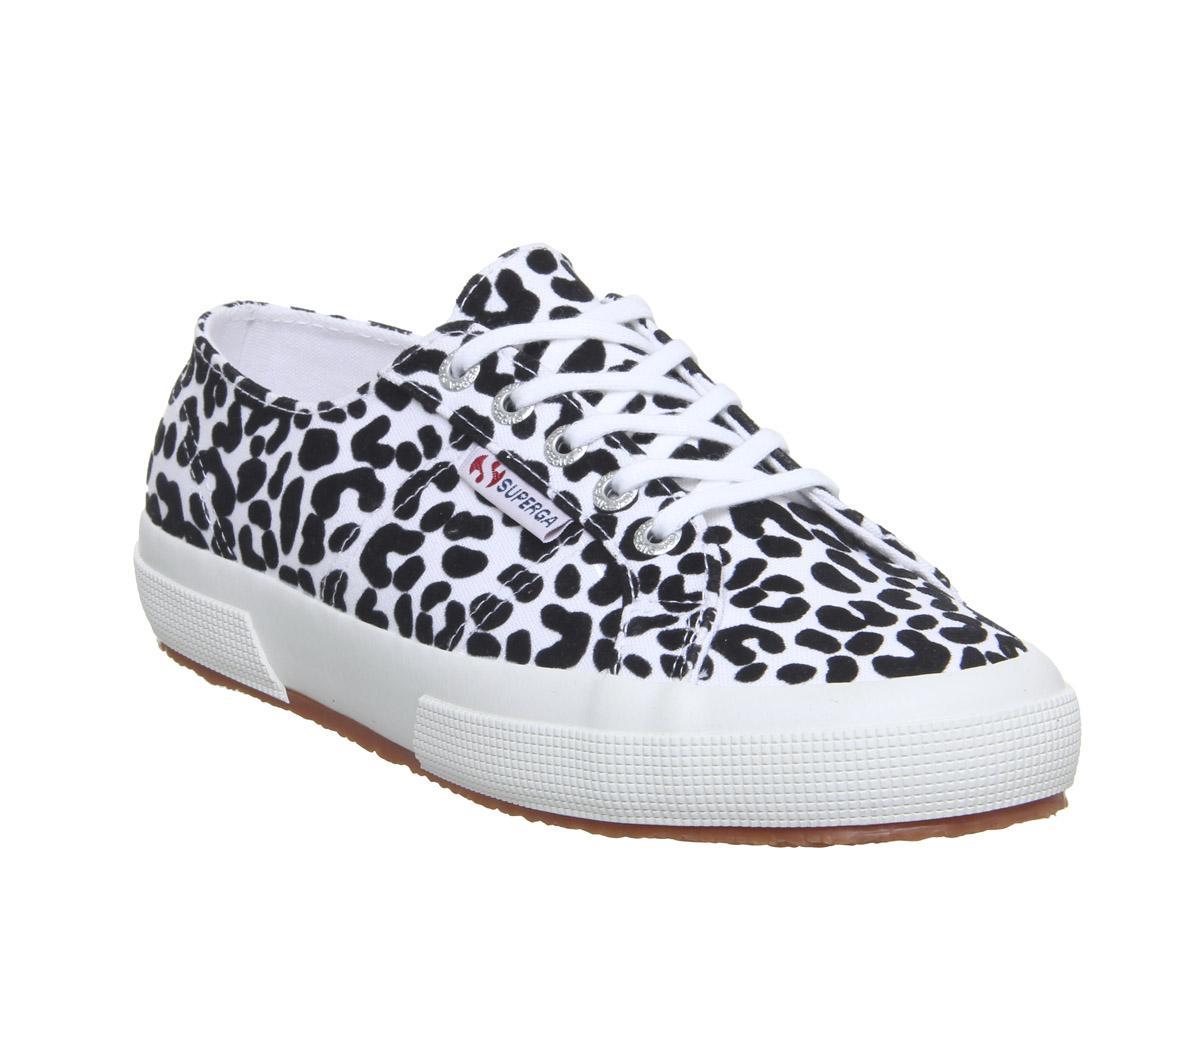 Superga 2750 White Leopard Exclusive